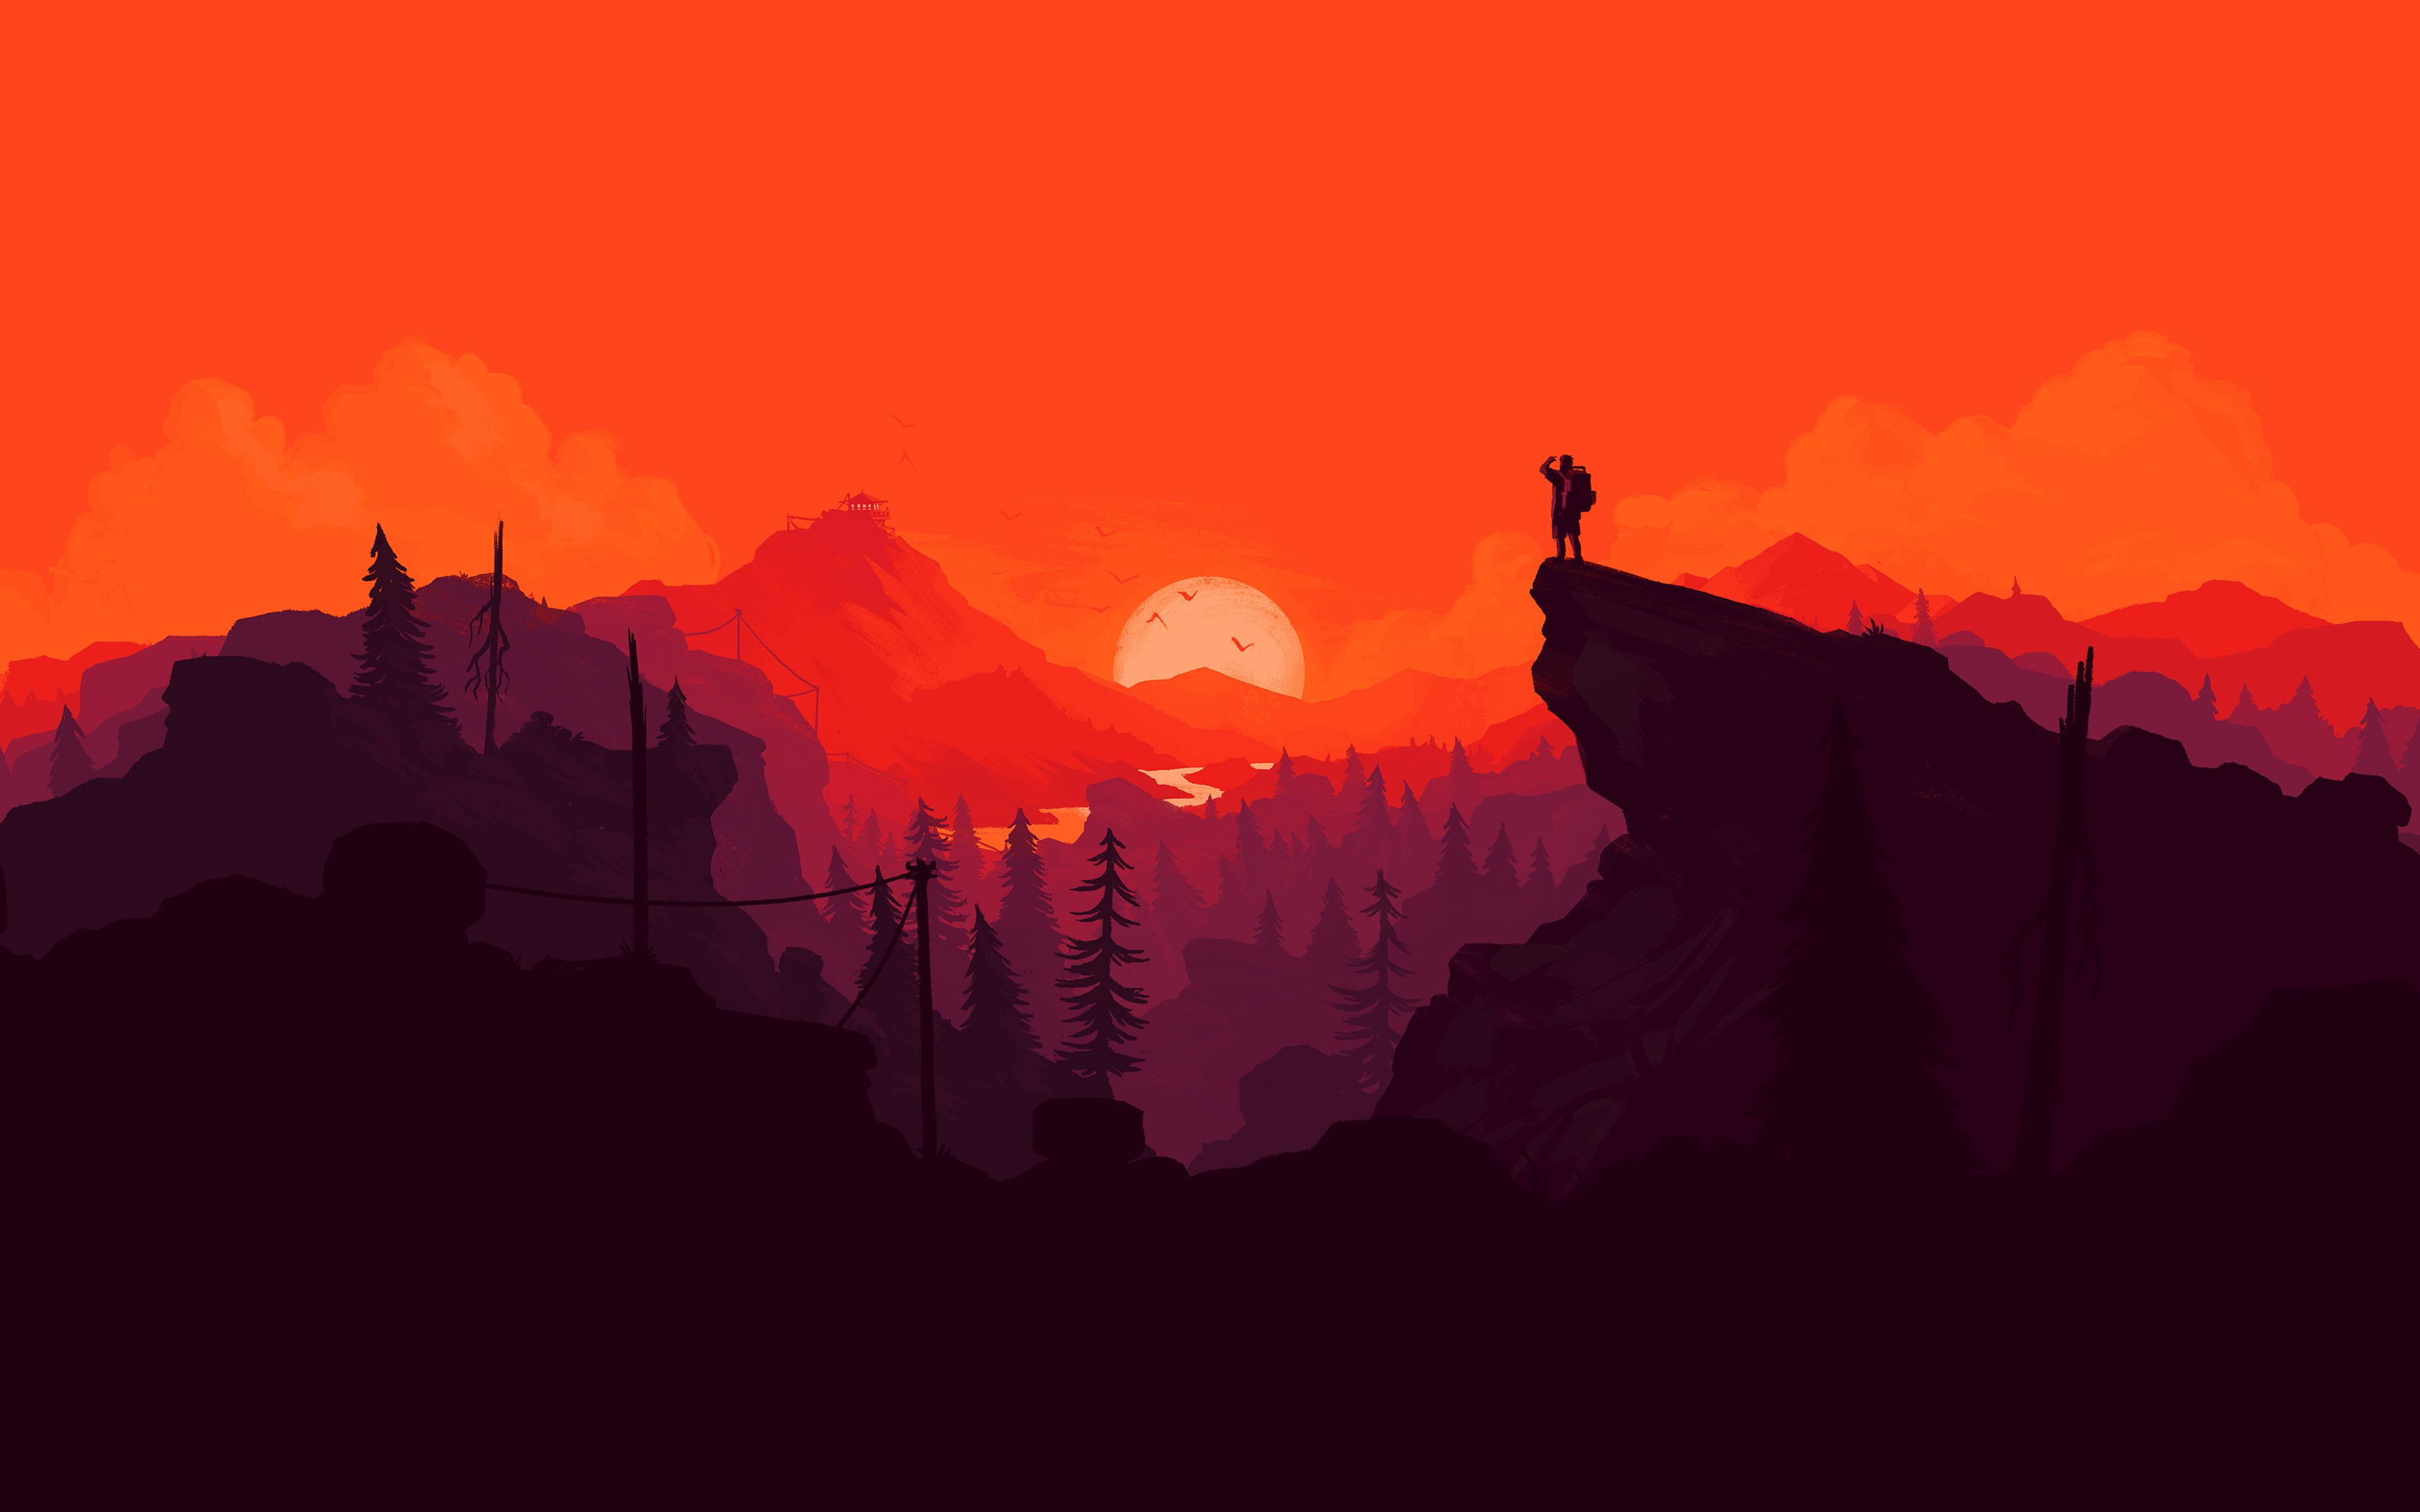 Person Standing On Mountain Cliff Painting Illustration Landscape Digital Art Mountains Firewatch Video Games Nature A Illustration Art Art Wallpaper Art